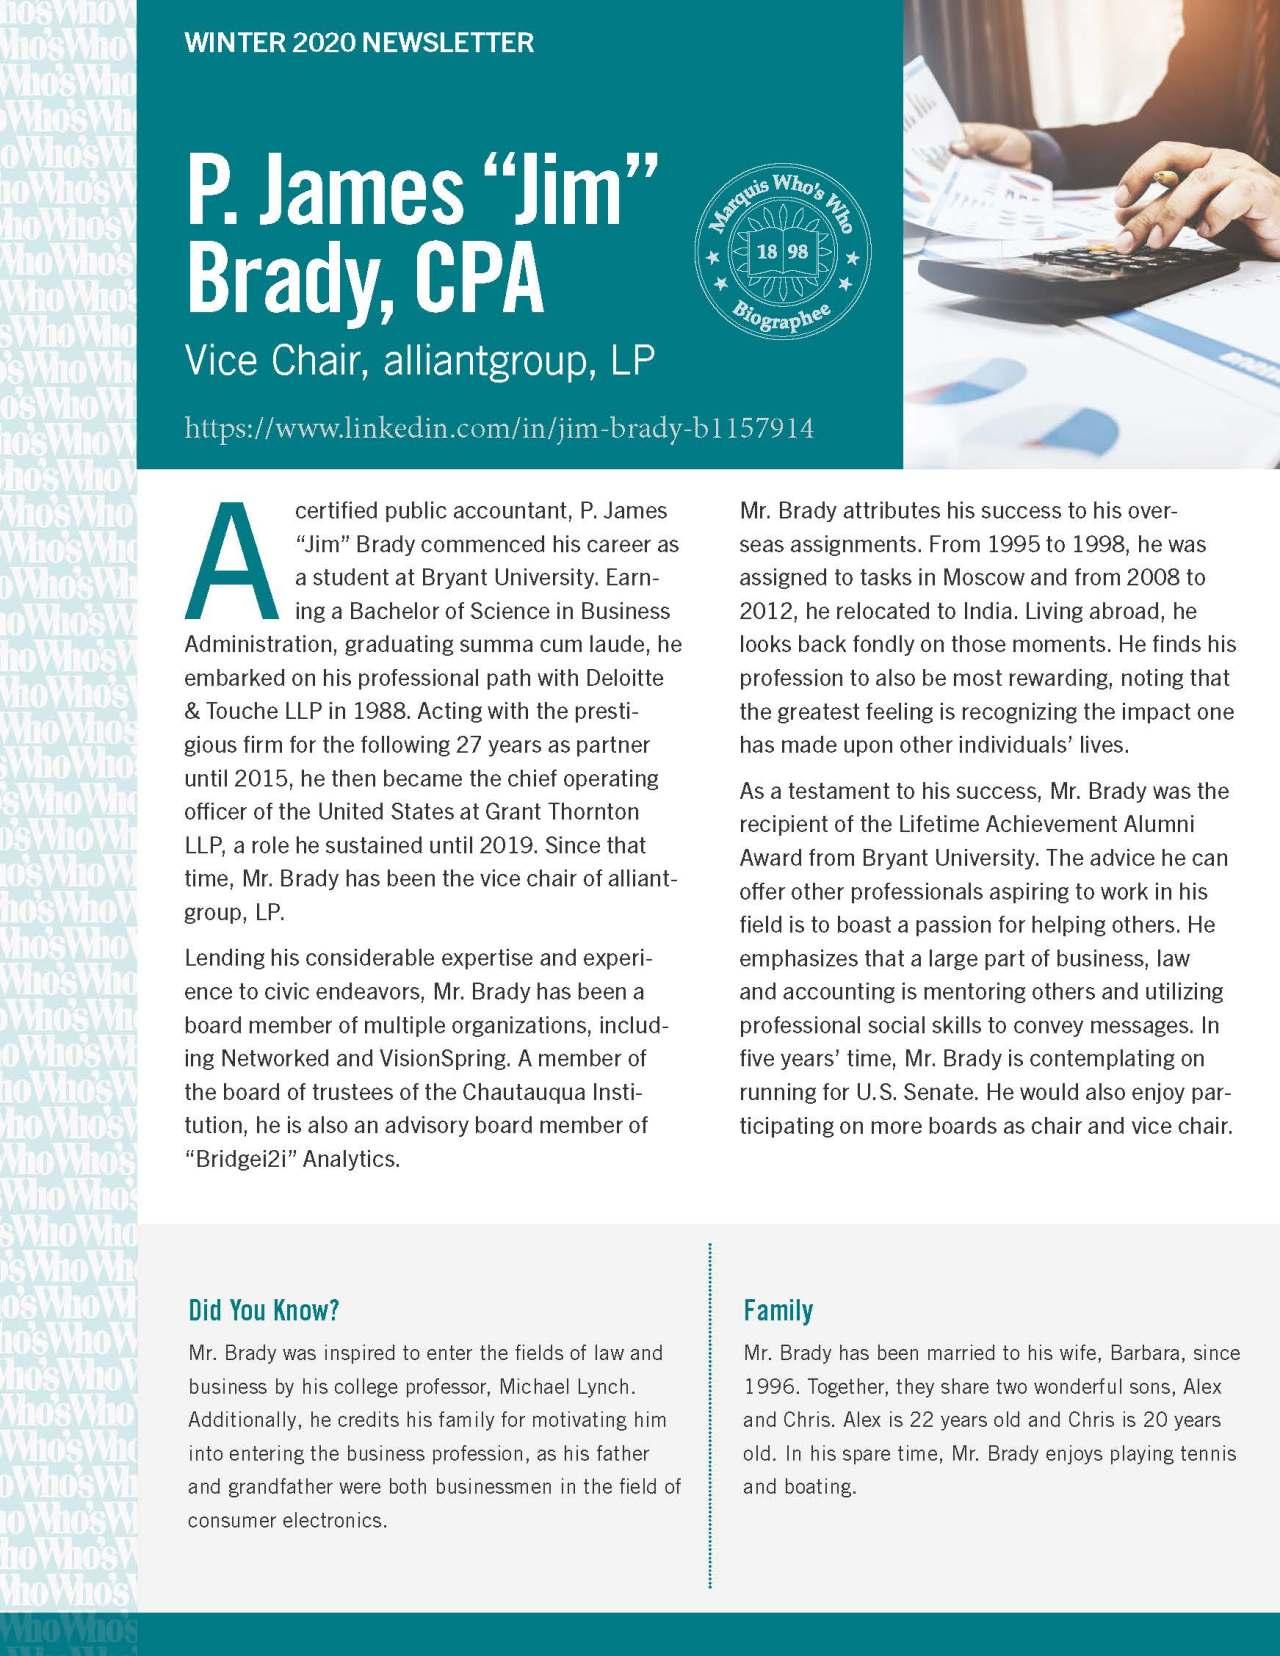 Brady, P. James 4298232_4004298232 Newsletter